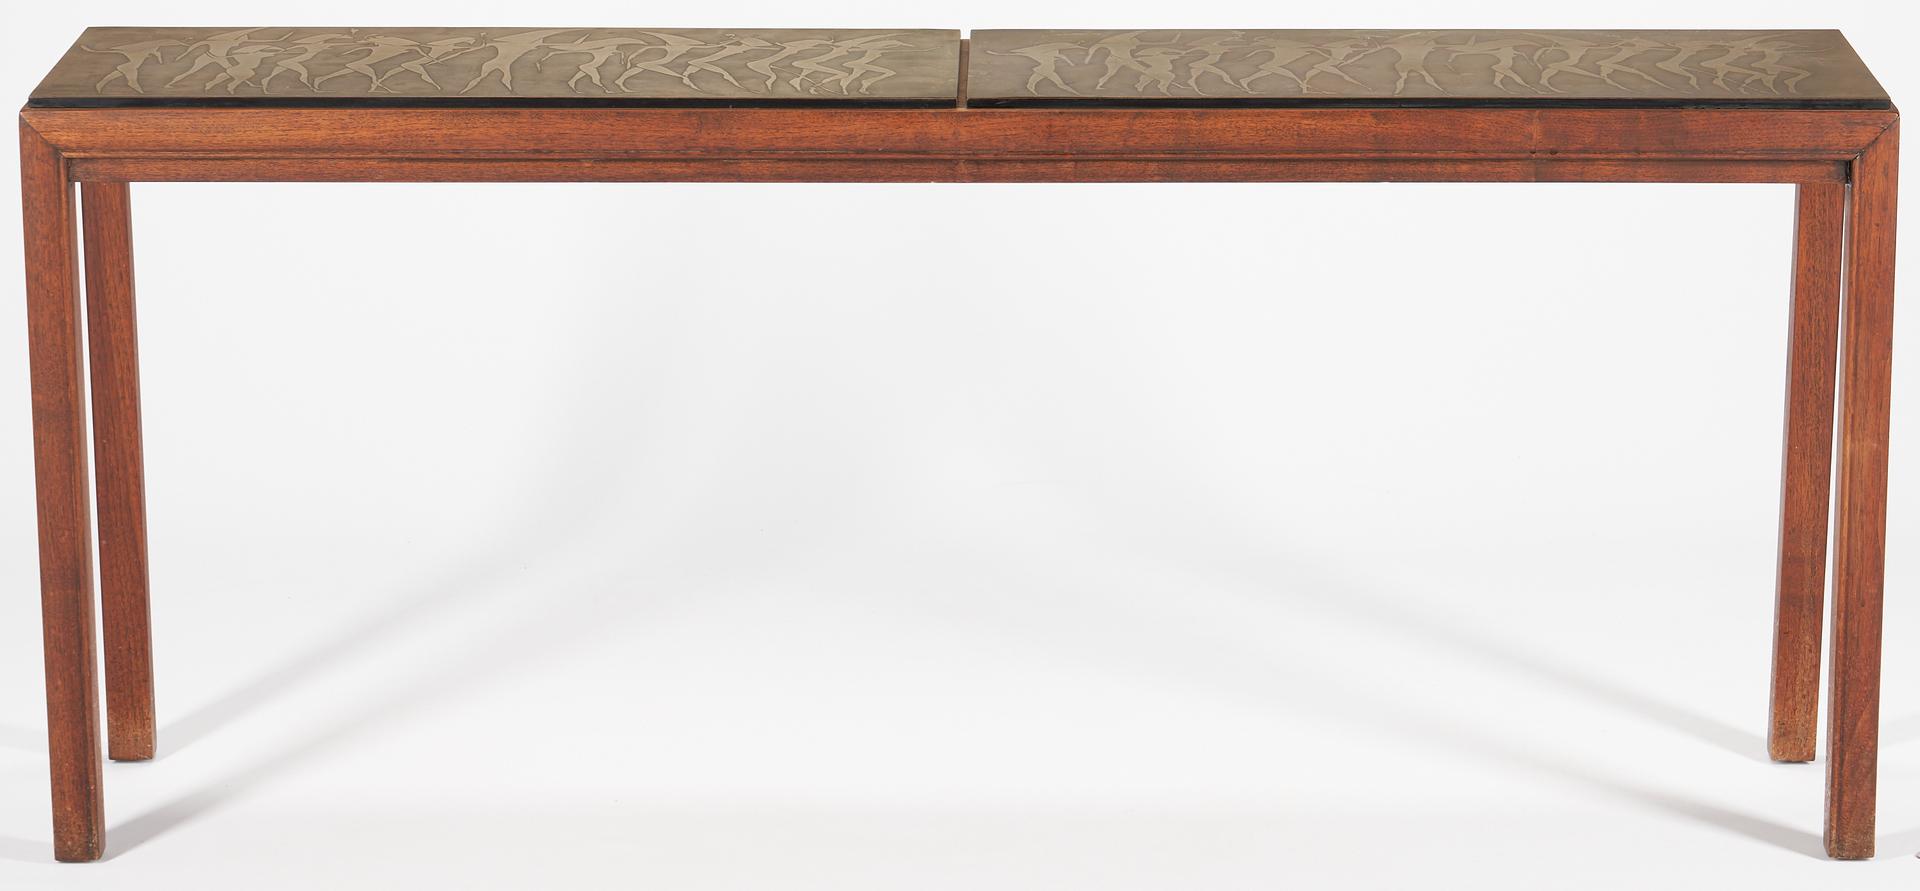 Lot 855: Mid-Century Console Table by John Stuart